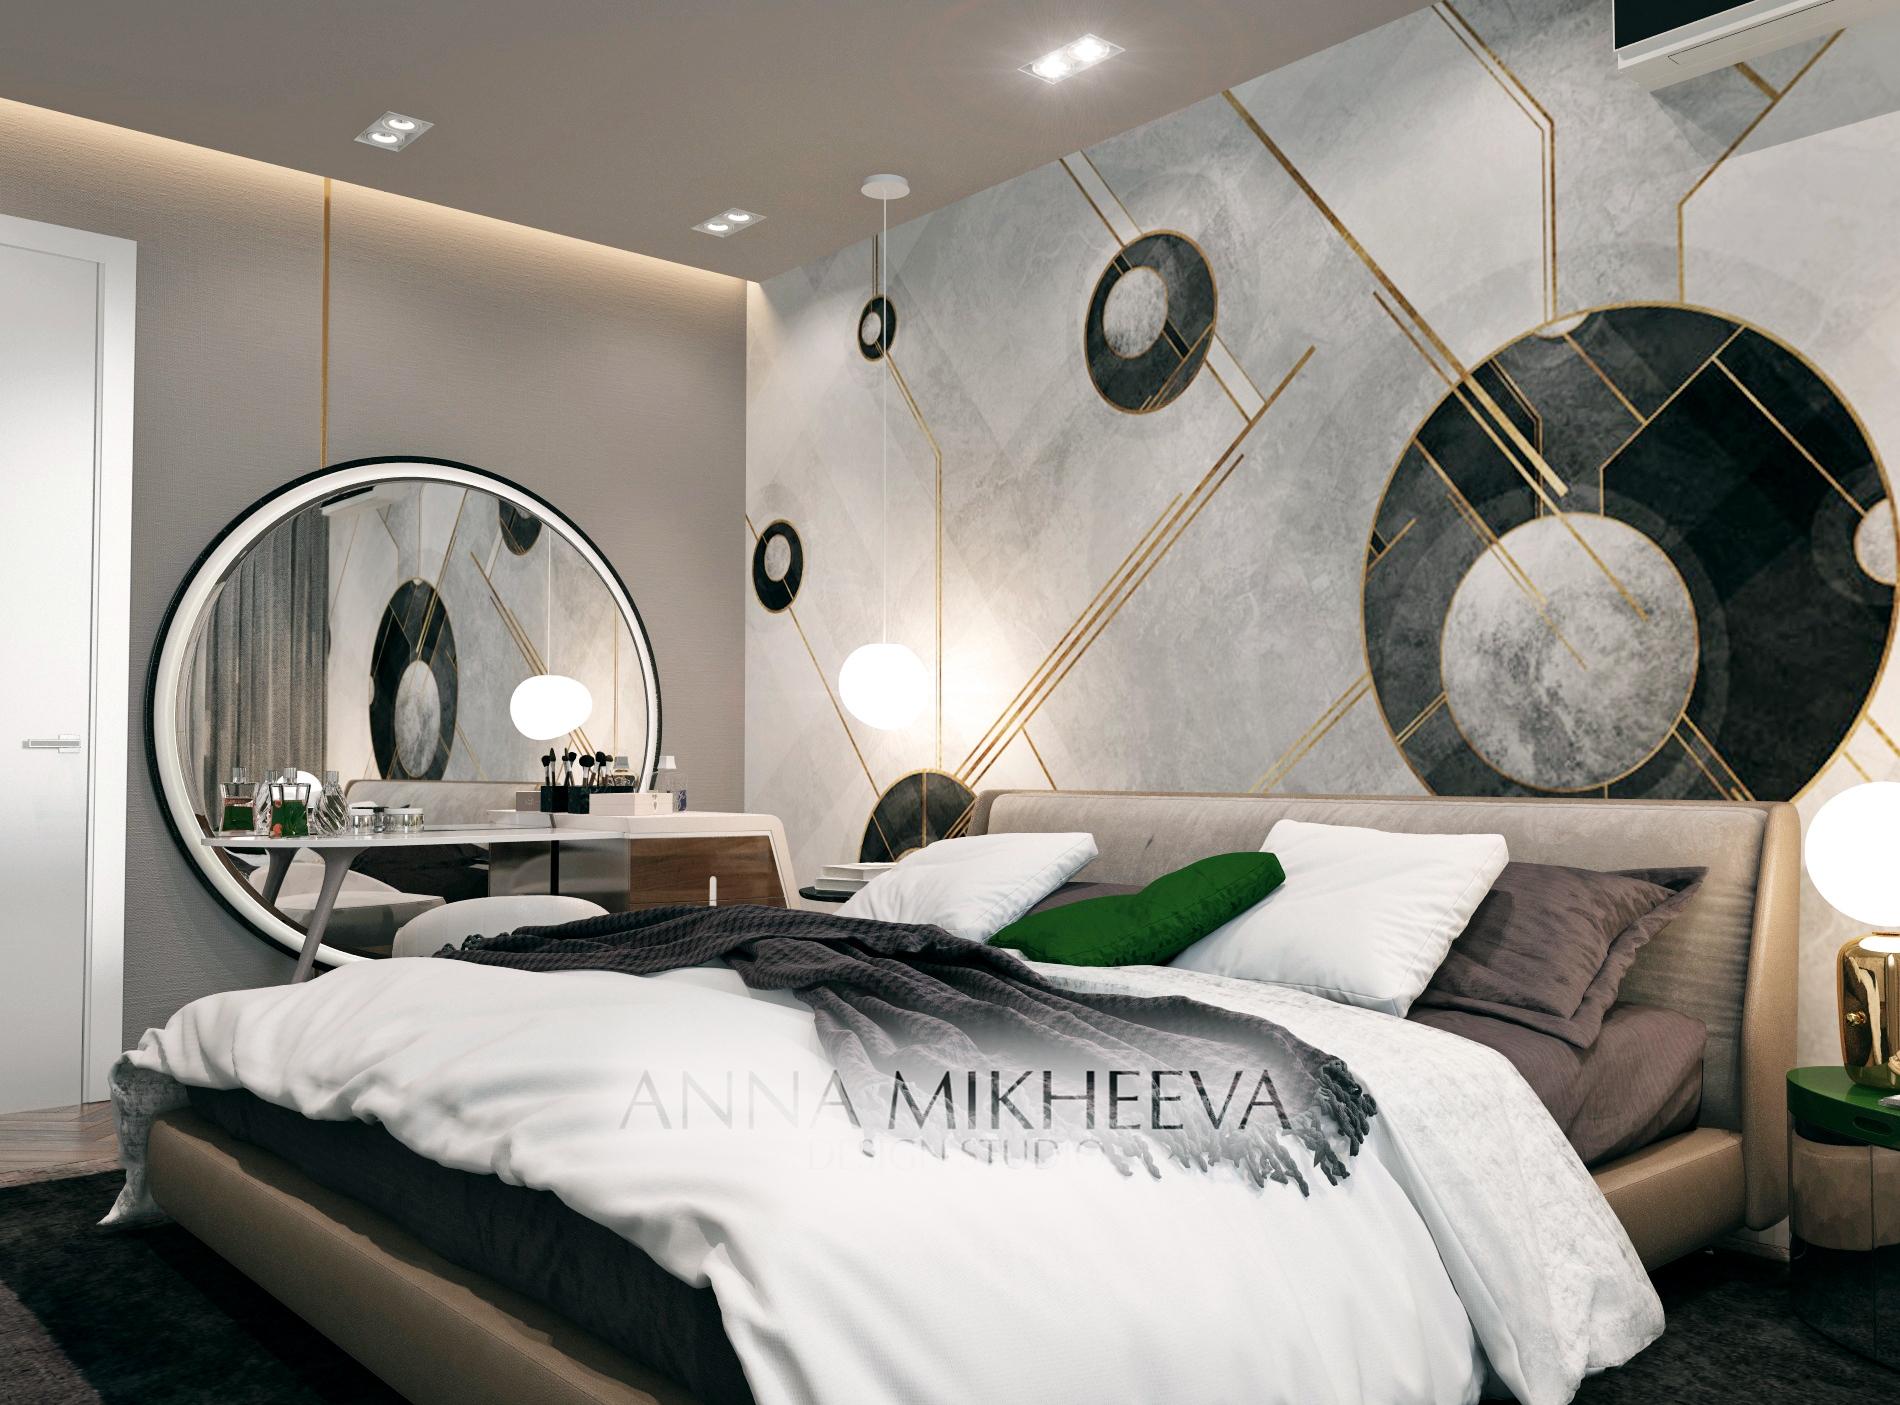 Мебель для спальни. В Нур-султане. Астане. Фото